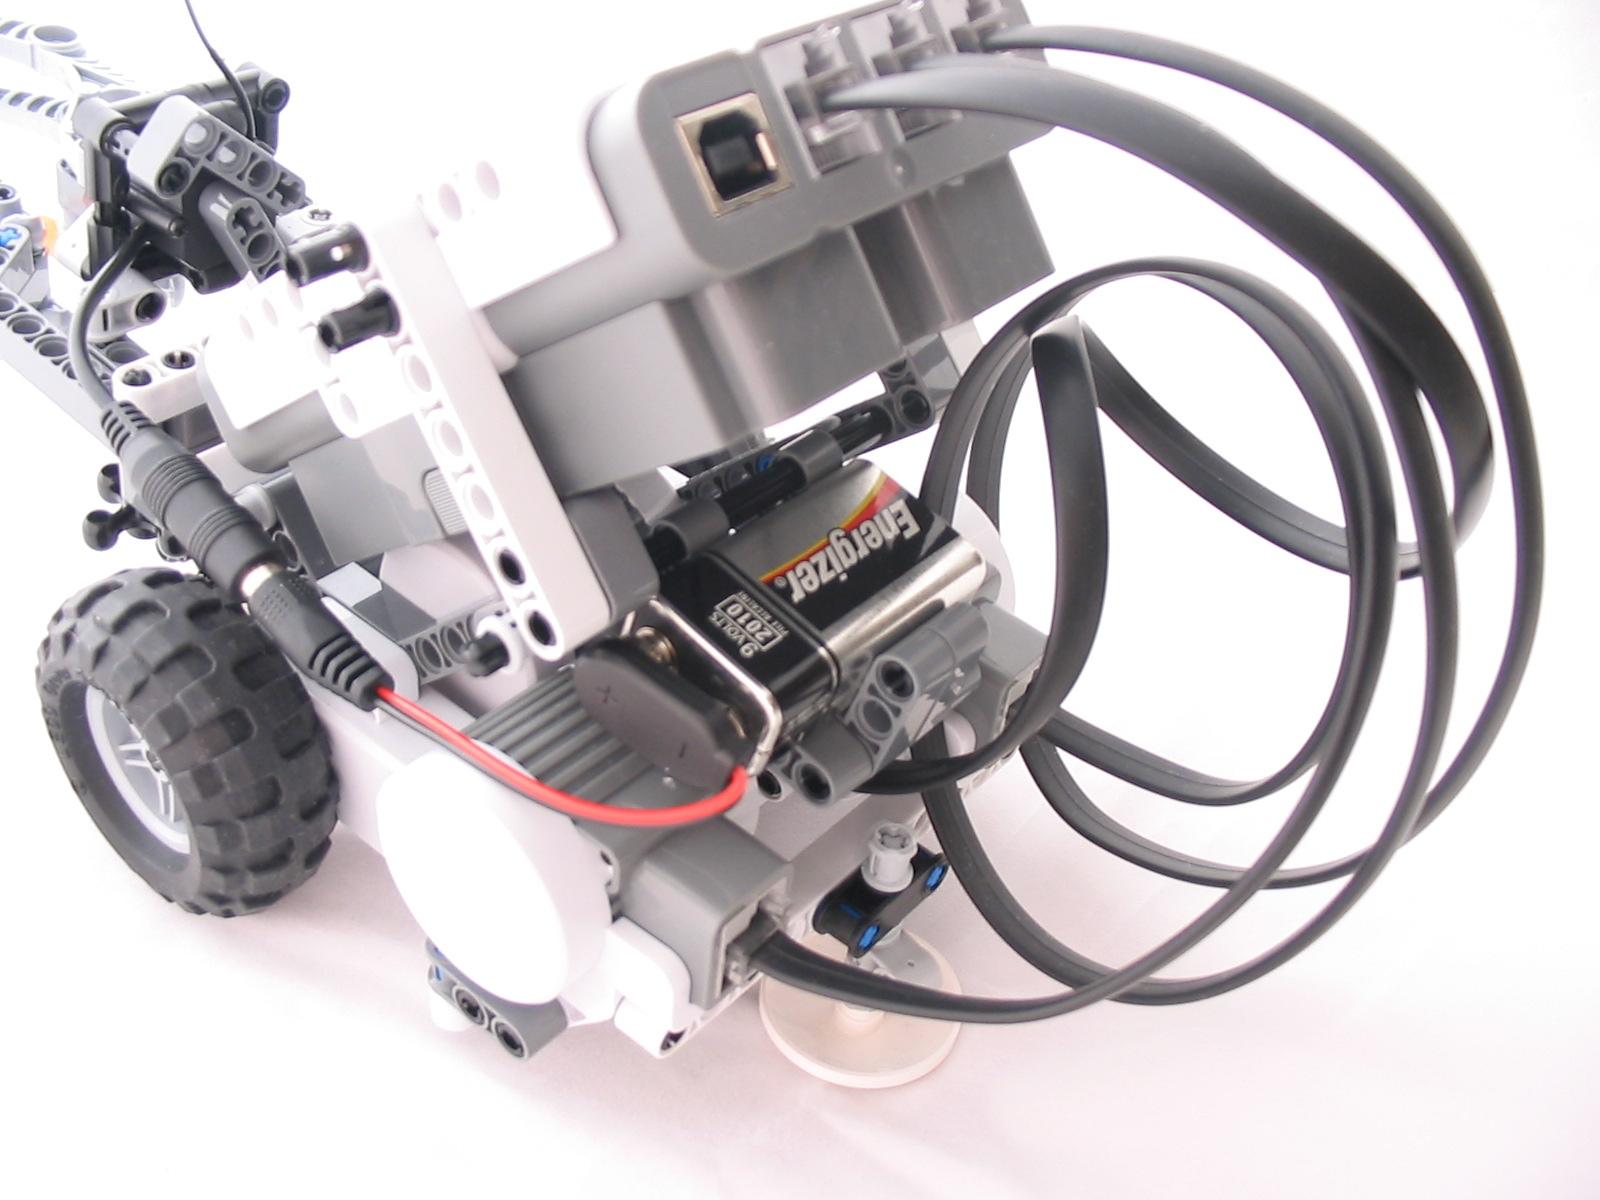 Camera Lego Nxt : Lego nxt ball grabber